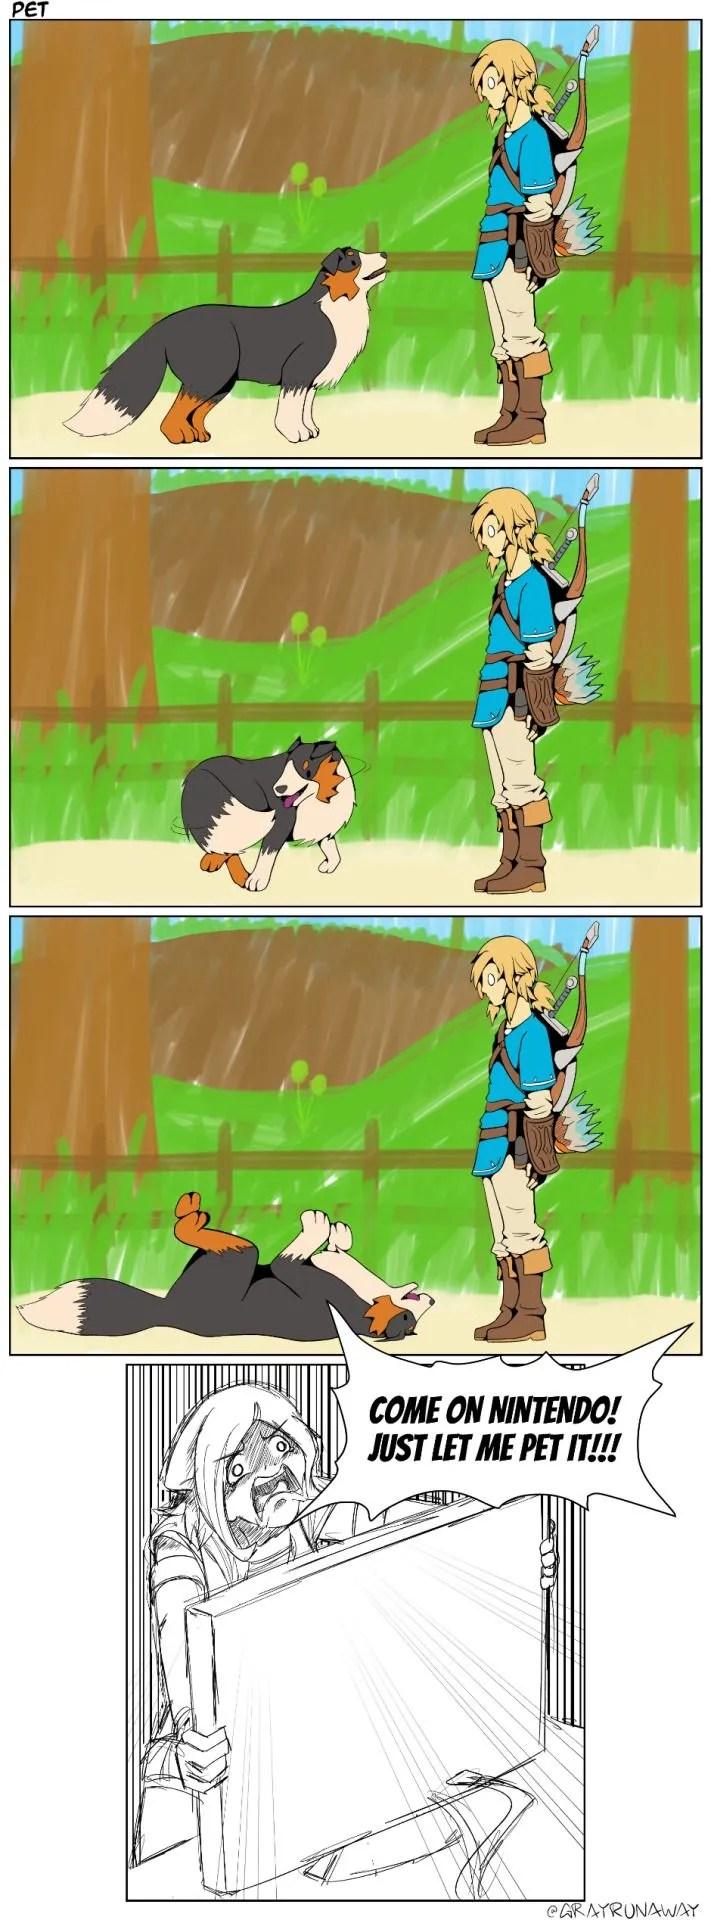 Botw Memes Clean : memes, clean, Hilarious, Zelda:, Breath, Memes, Perfect